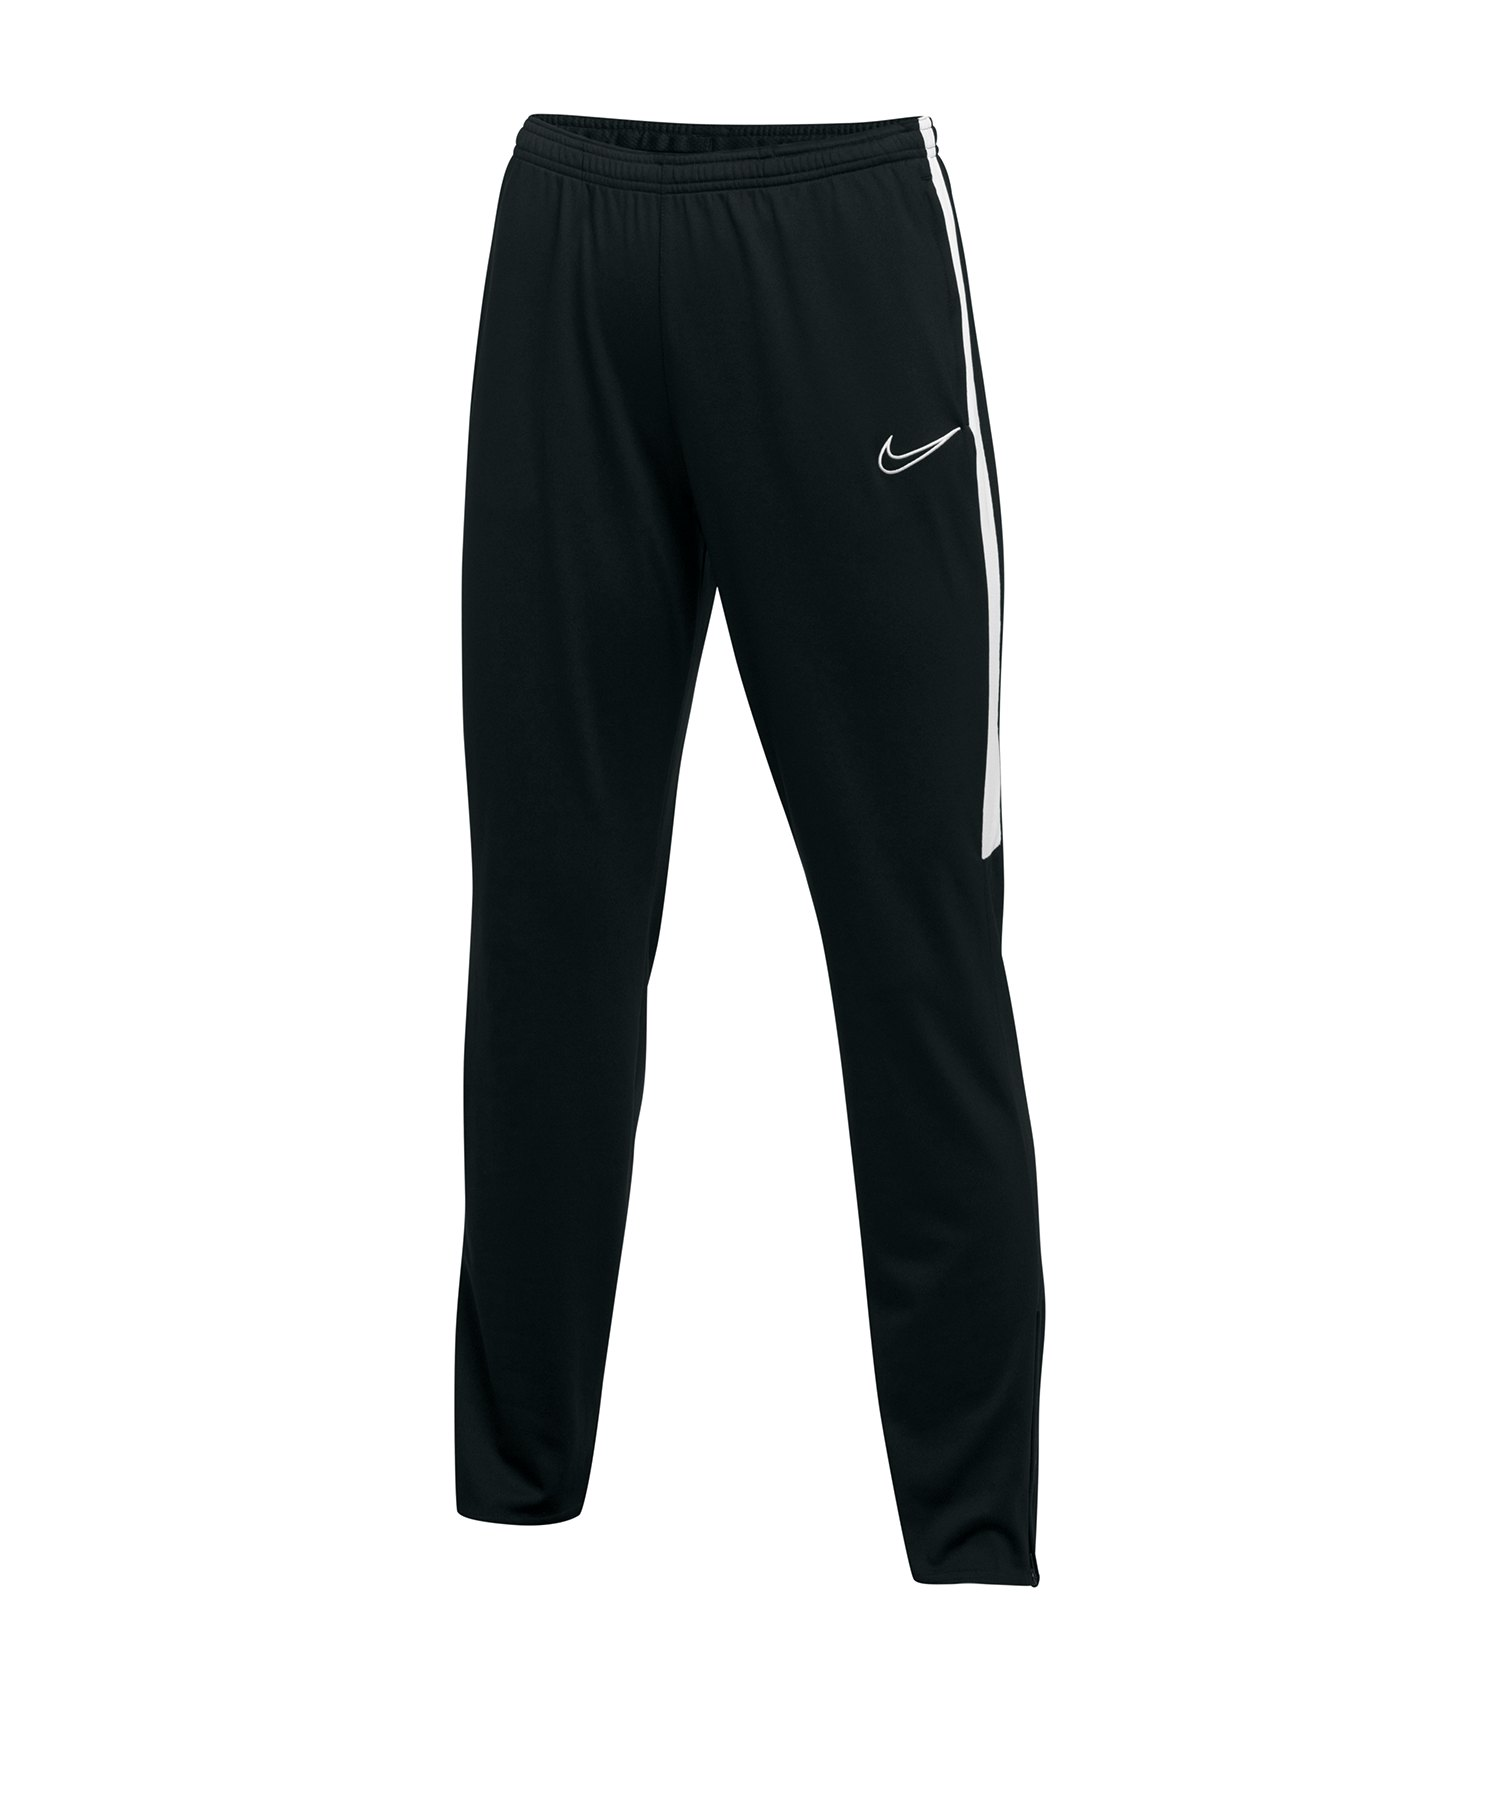 Nike Academy 19 Trainingshose Damen F010 - schwarz